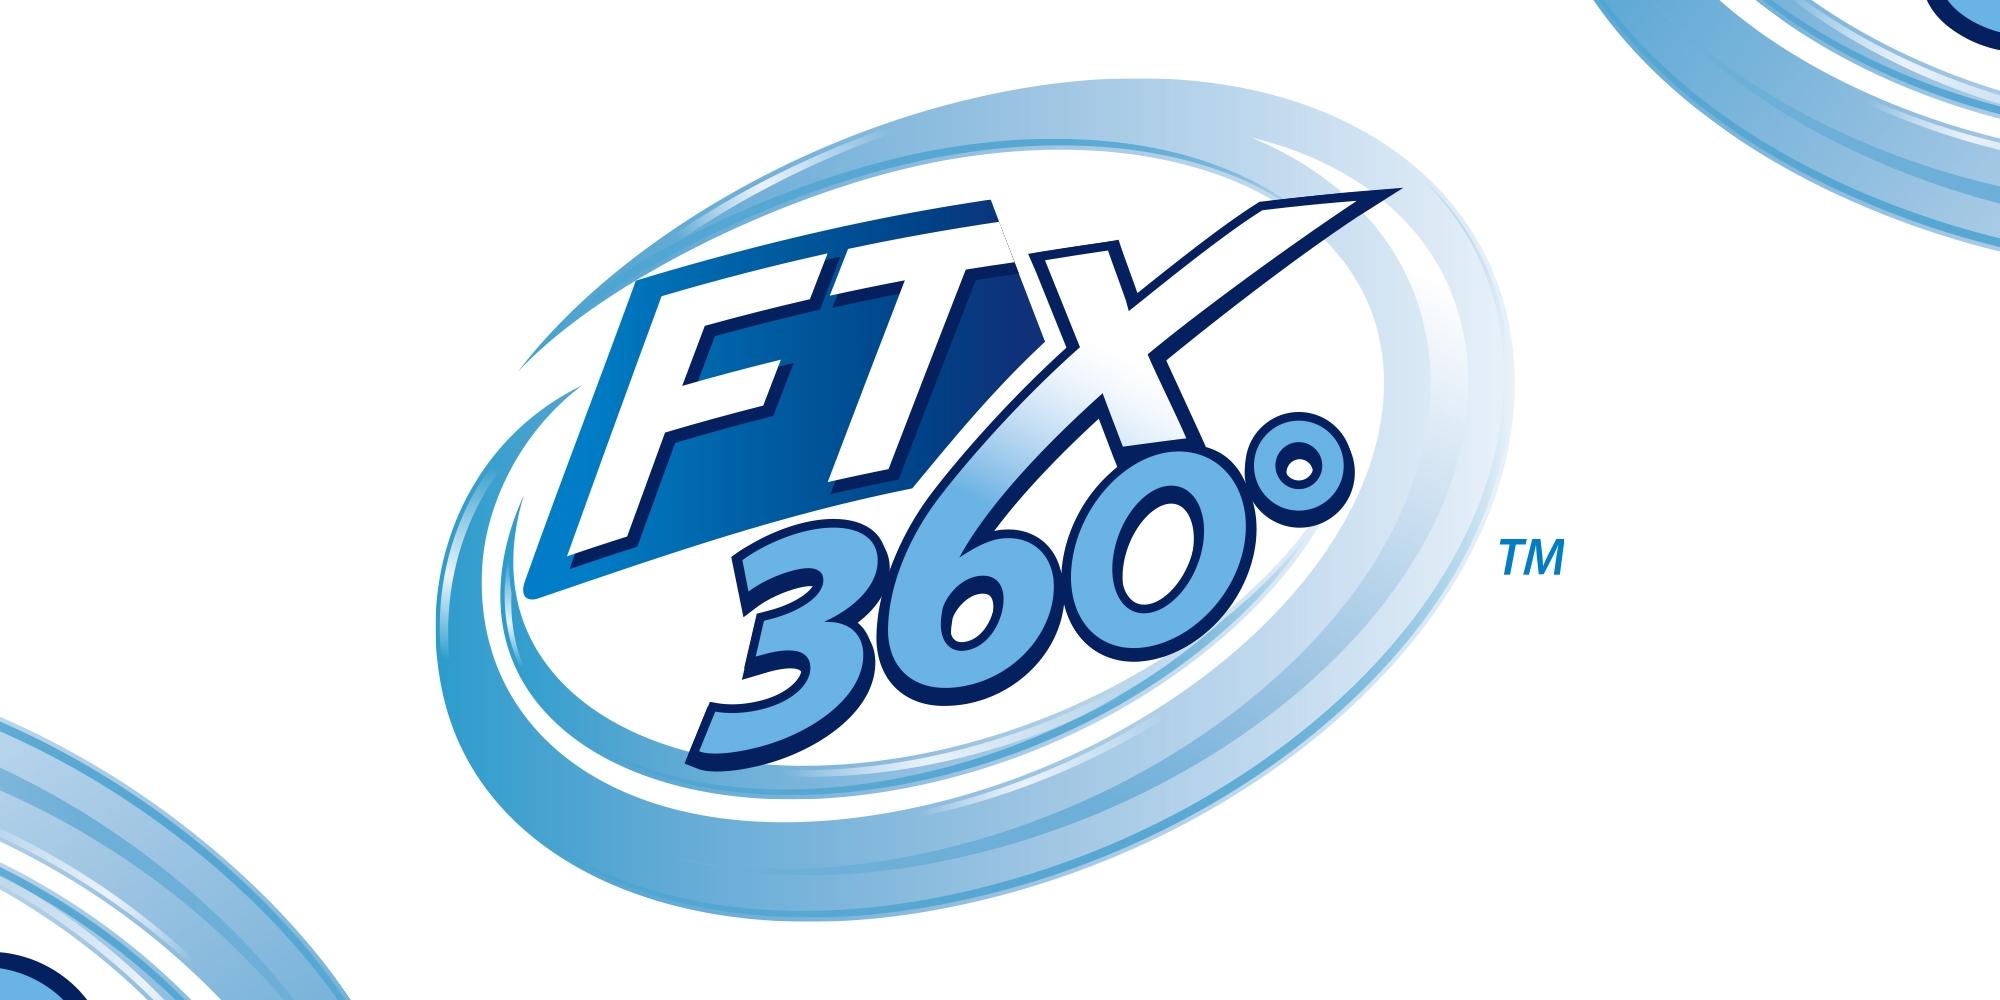 FTx360 Digital Agency (@ftx360digitalagency) Cover Image